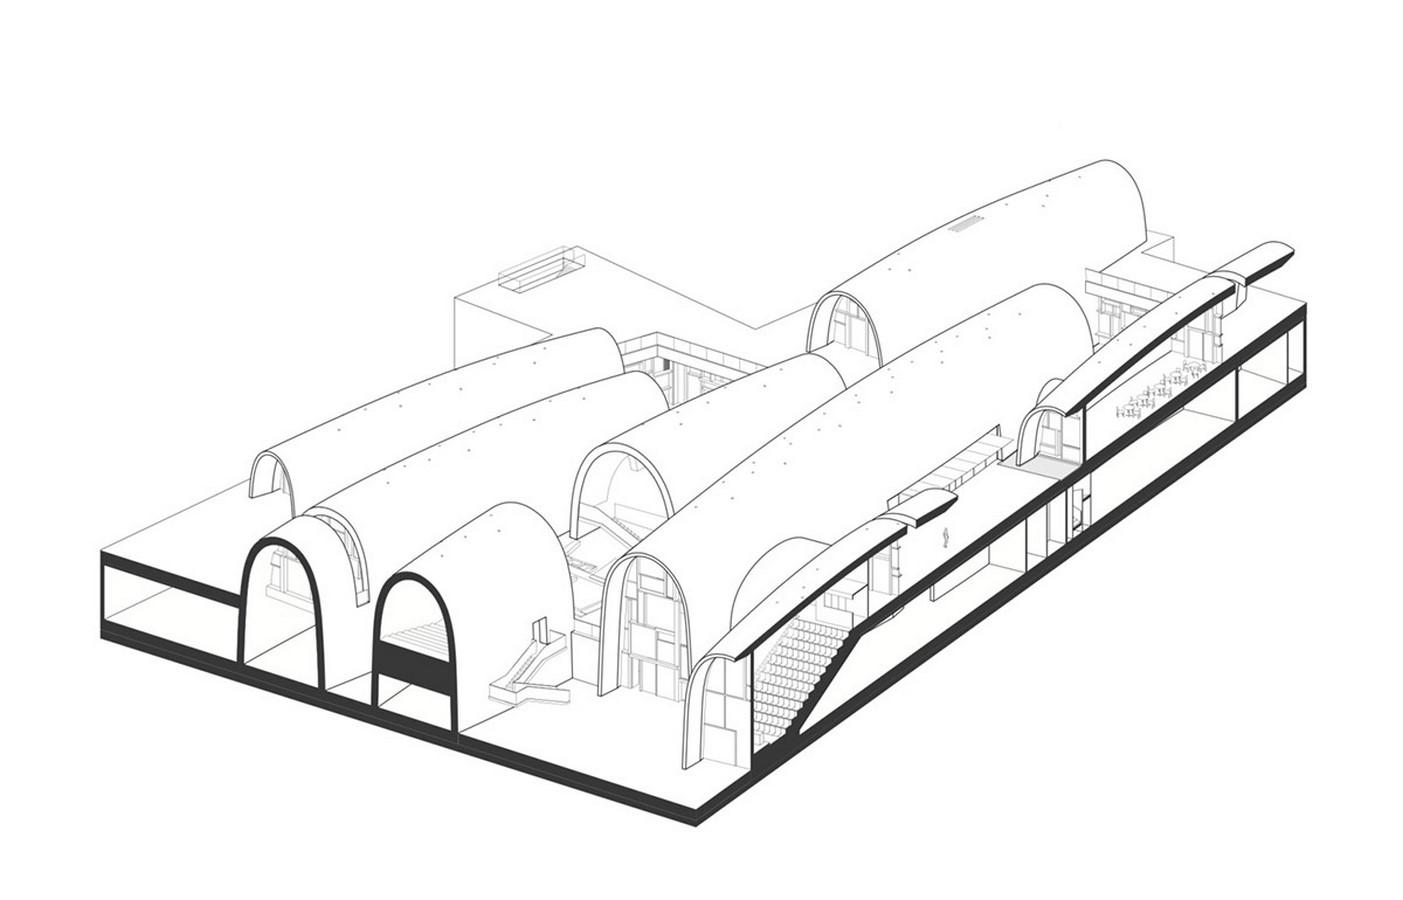 Giant Vaults From Recycled Old Kiln Bricks to transform into Jingdezhen Kiln Museum designed by Studio Zhu-Pei - Sheet4